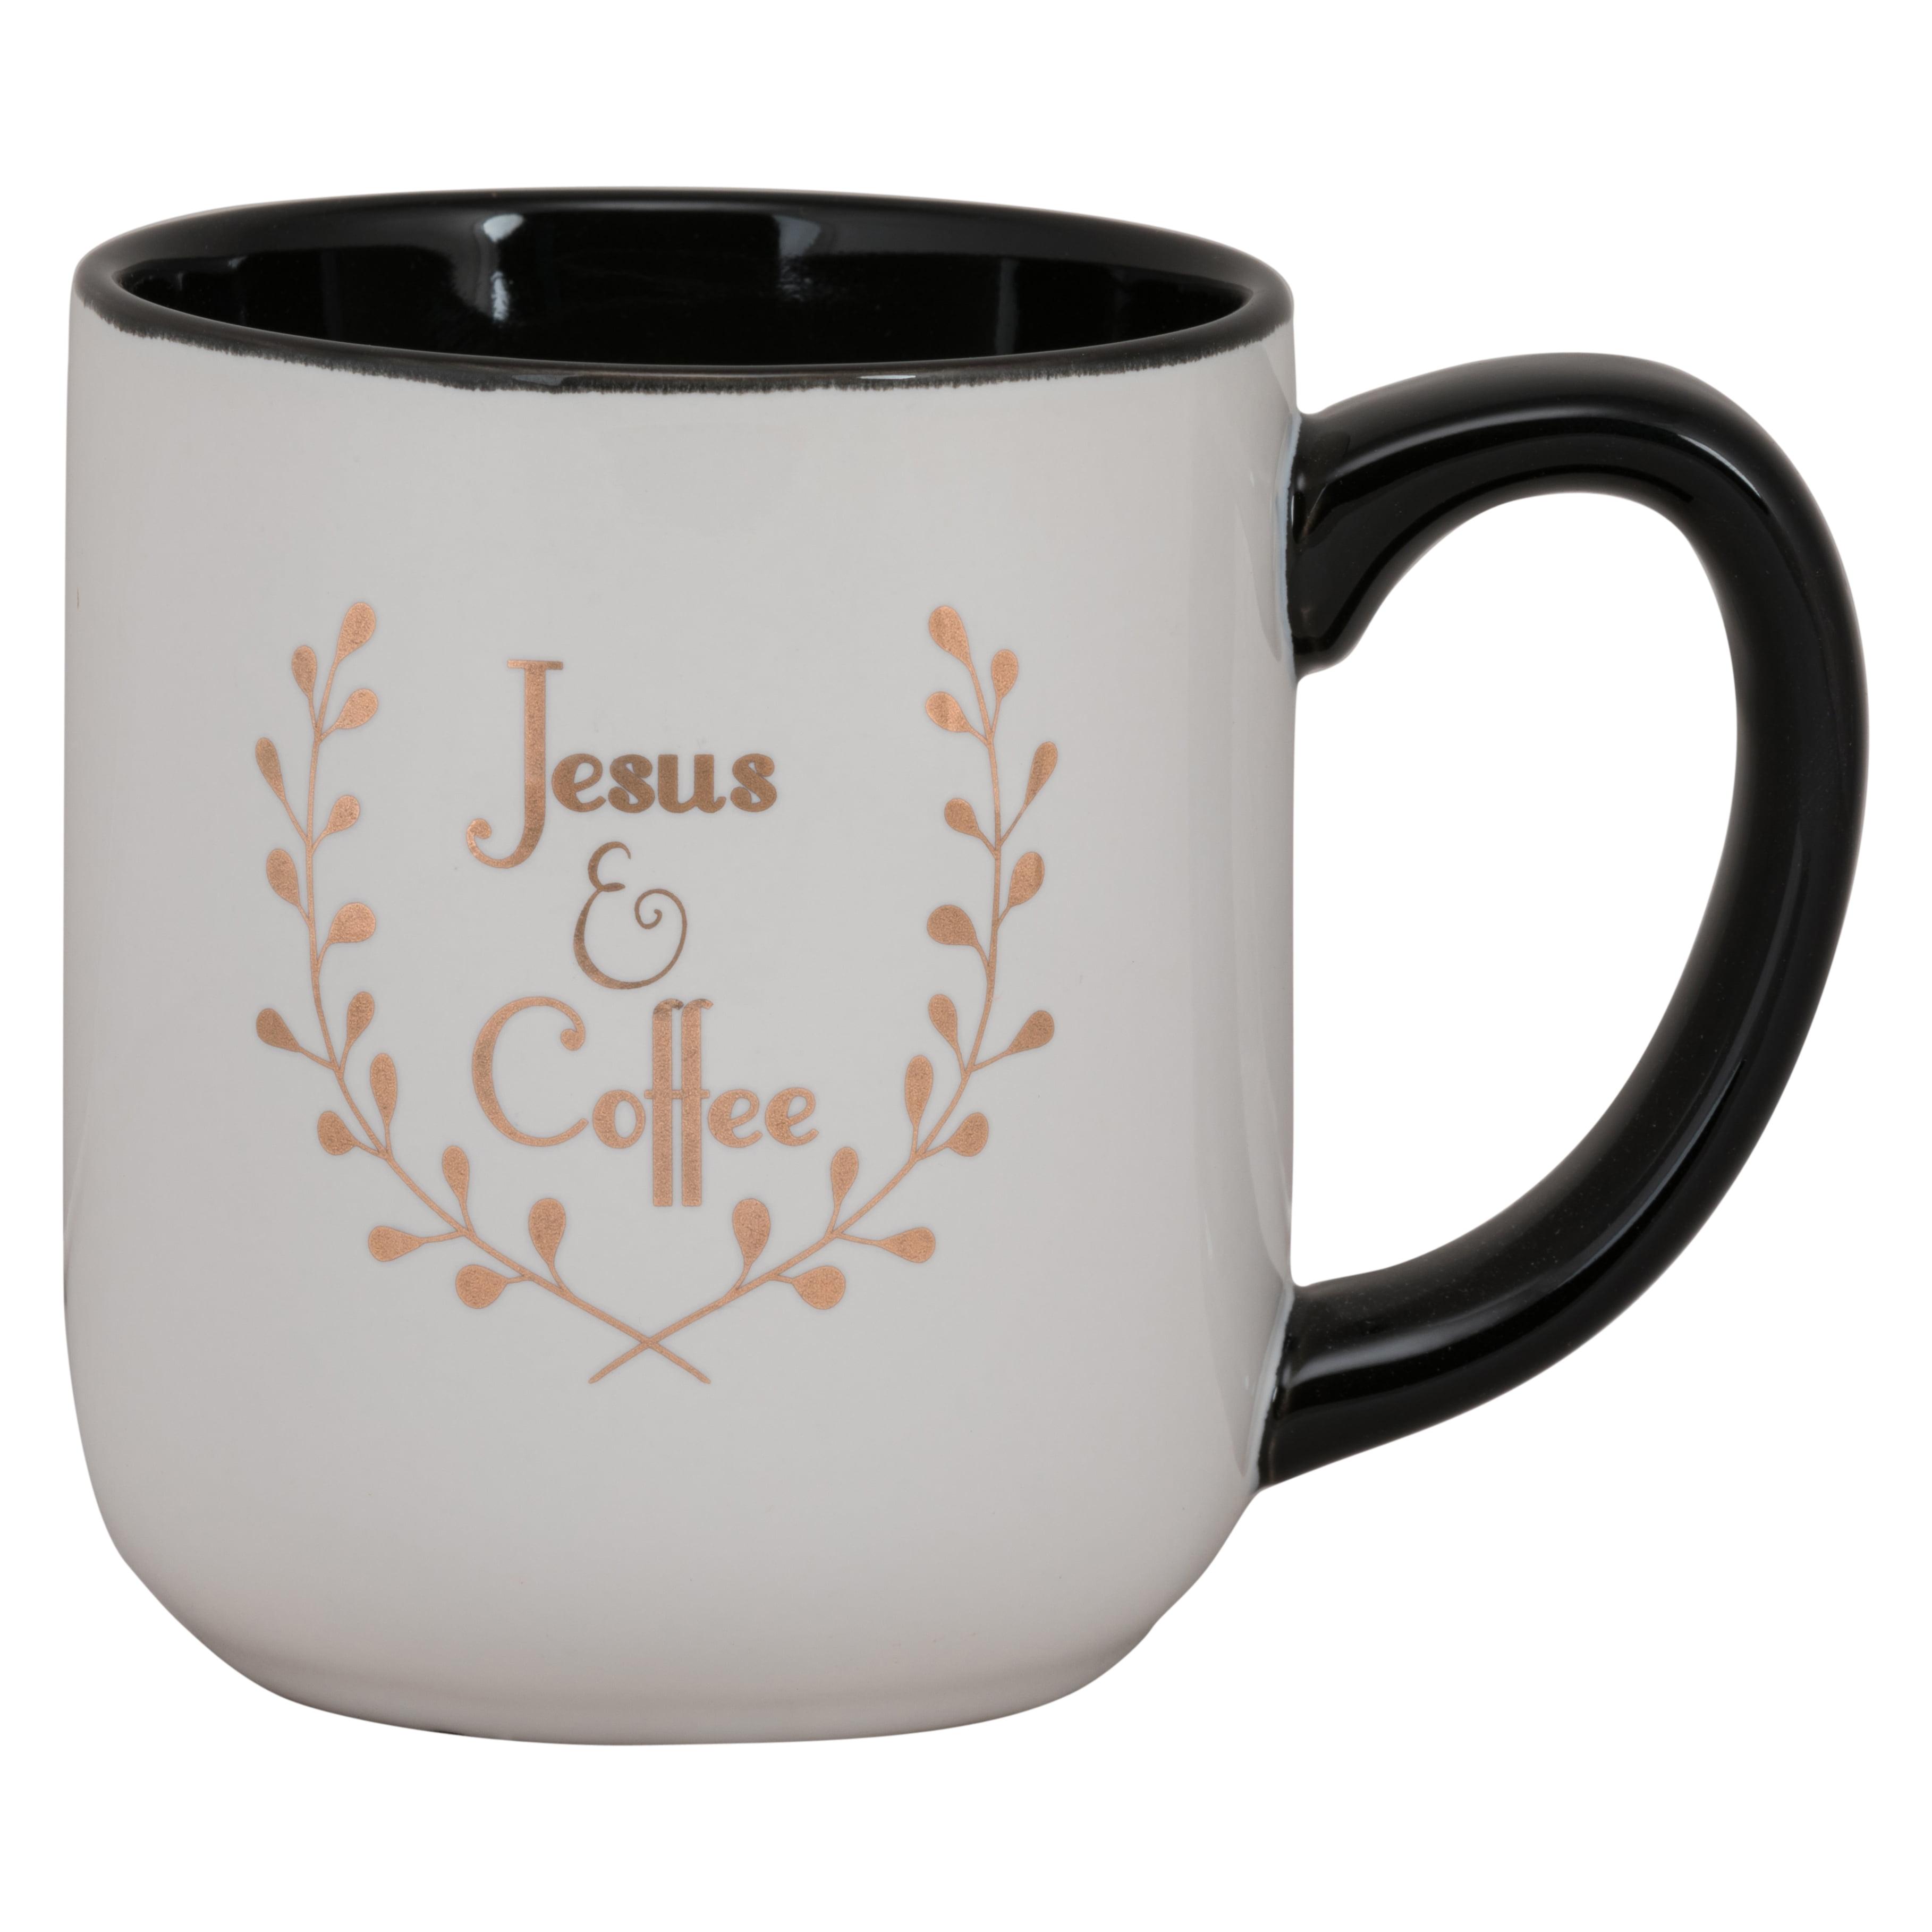 Jesus and Coffee Black Large 17.5 oz Mug